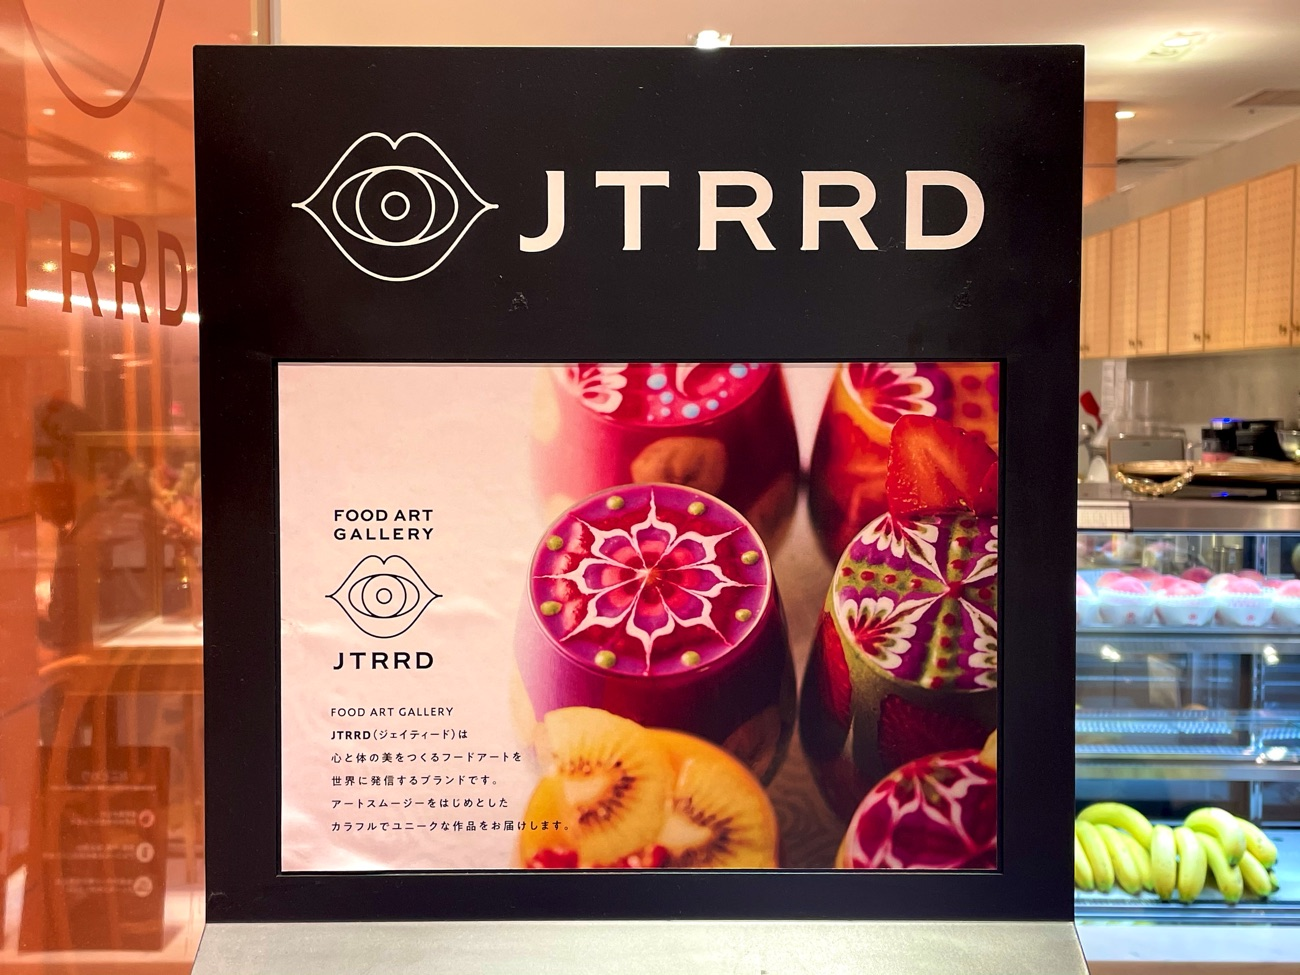 FOOD ART GALLERY_JTRRD